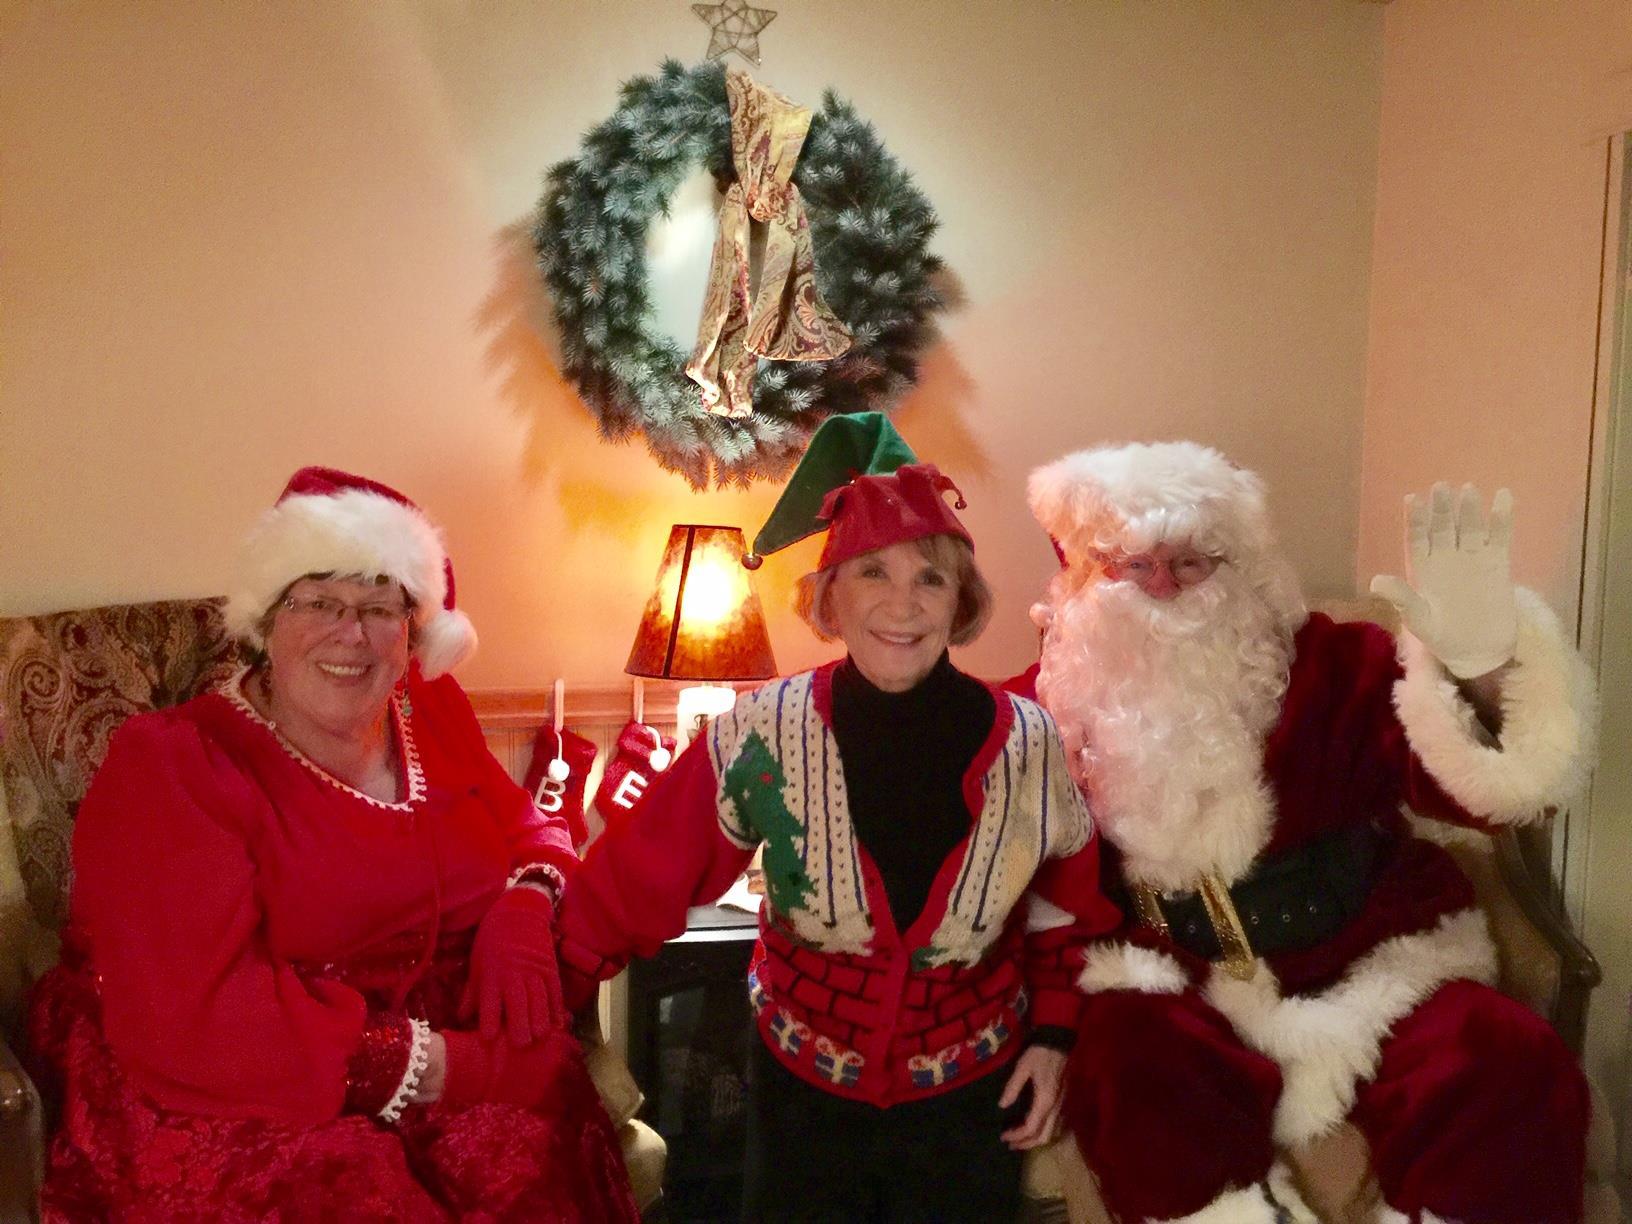 Cayucos Christmas Dec 2021 Christmas In Cayucos Rotary Club Of Cayucos